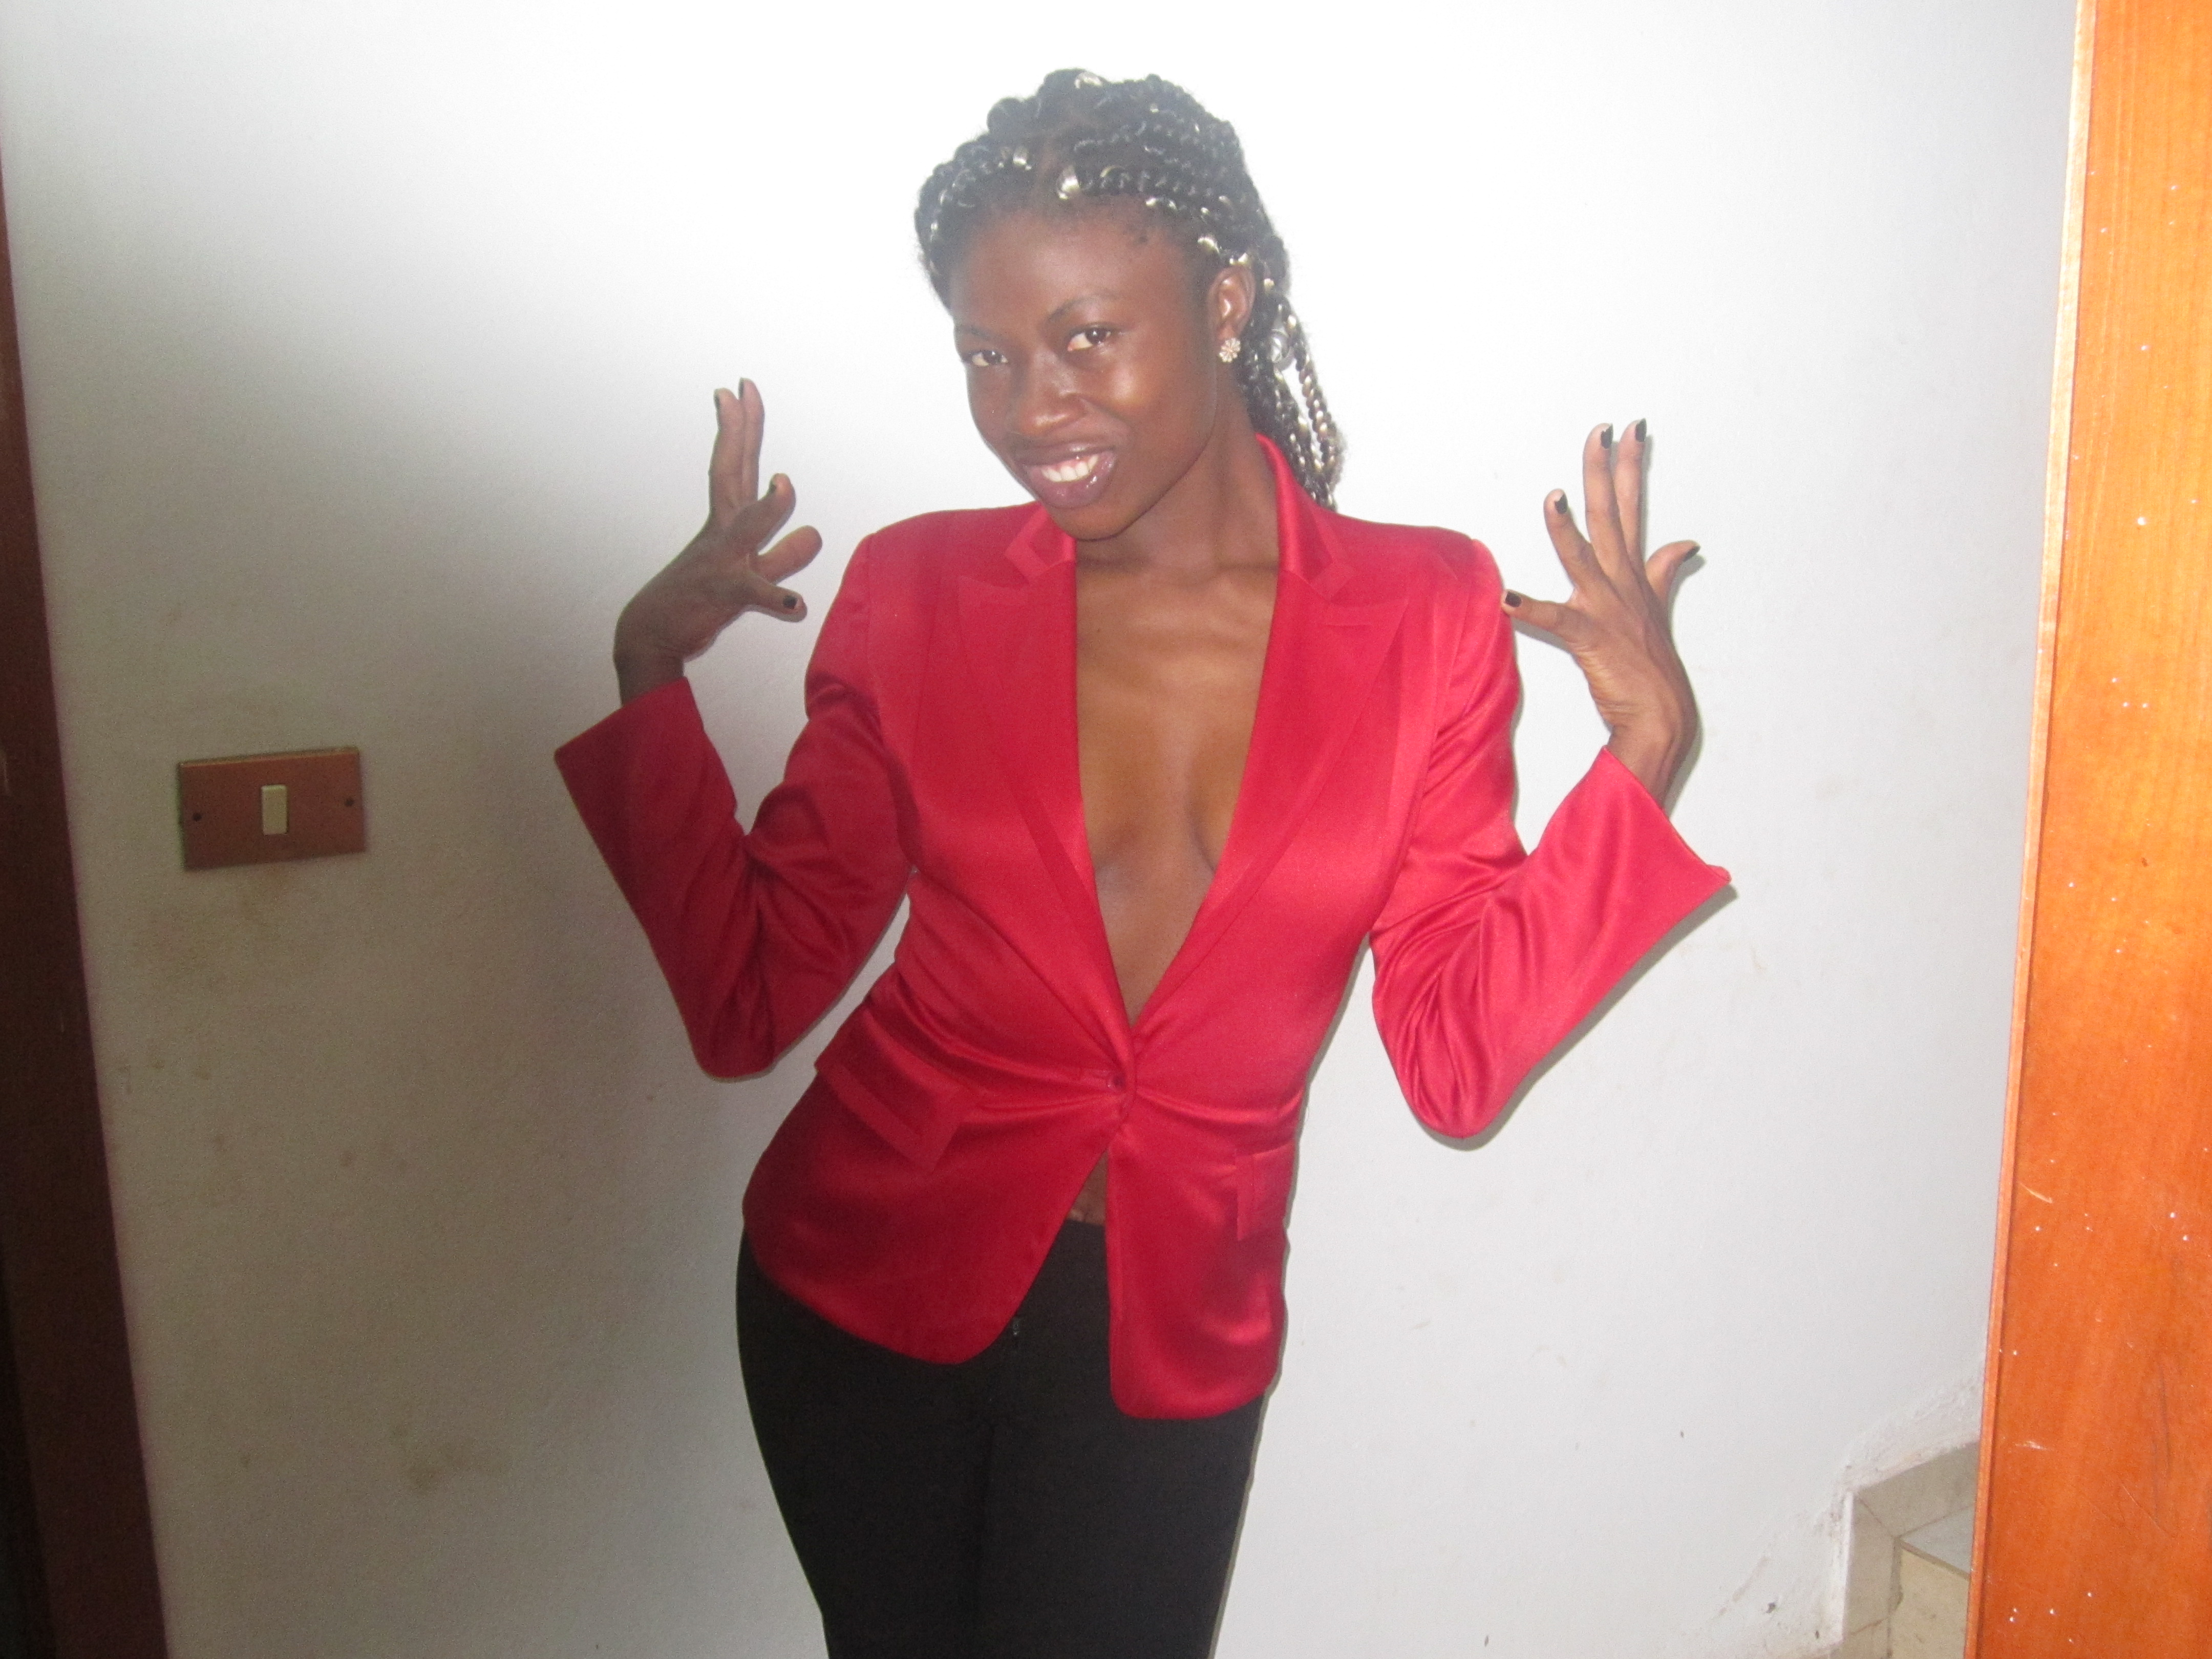 Lornoar avec une veste rouge sexy